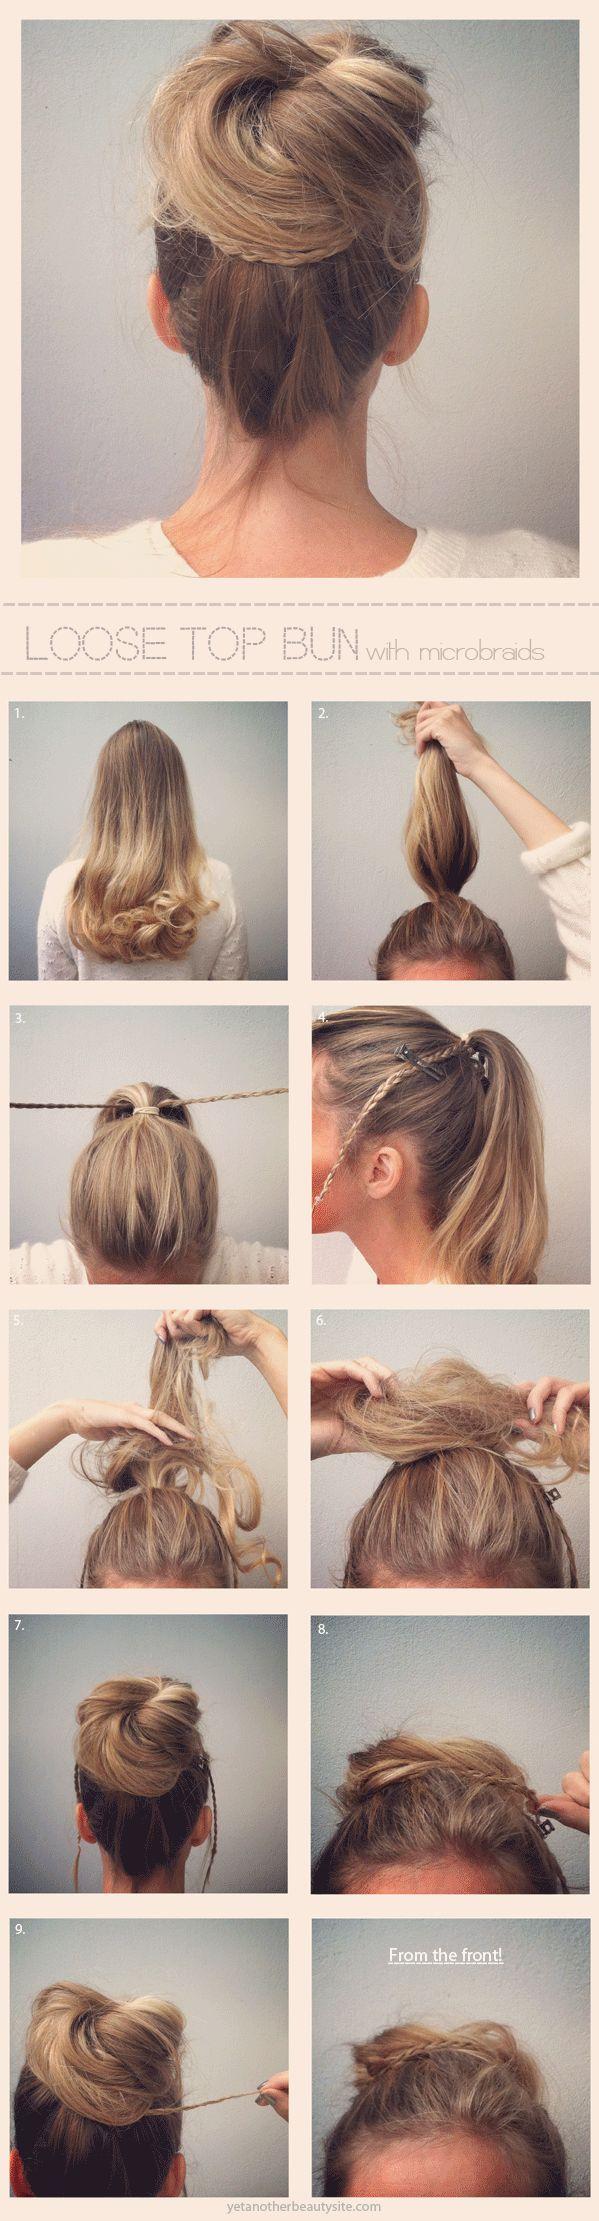 Pin by betül yılmaz on hair u make up pinterest medium long hair